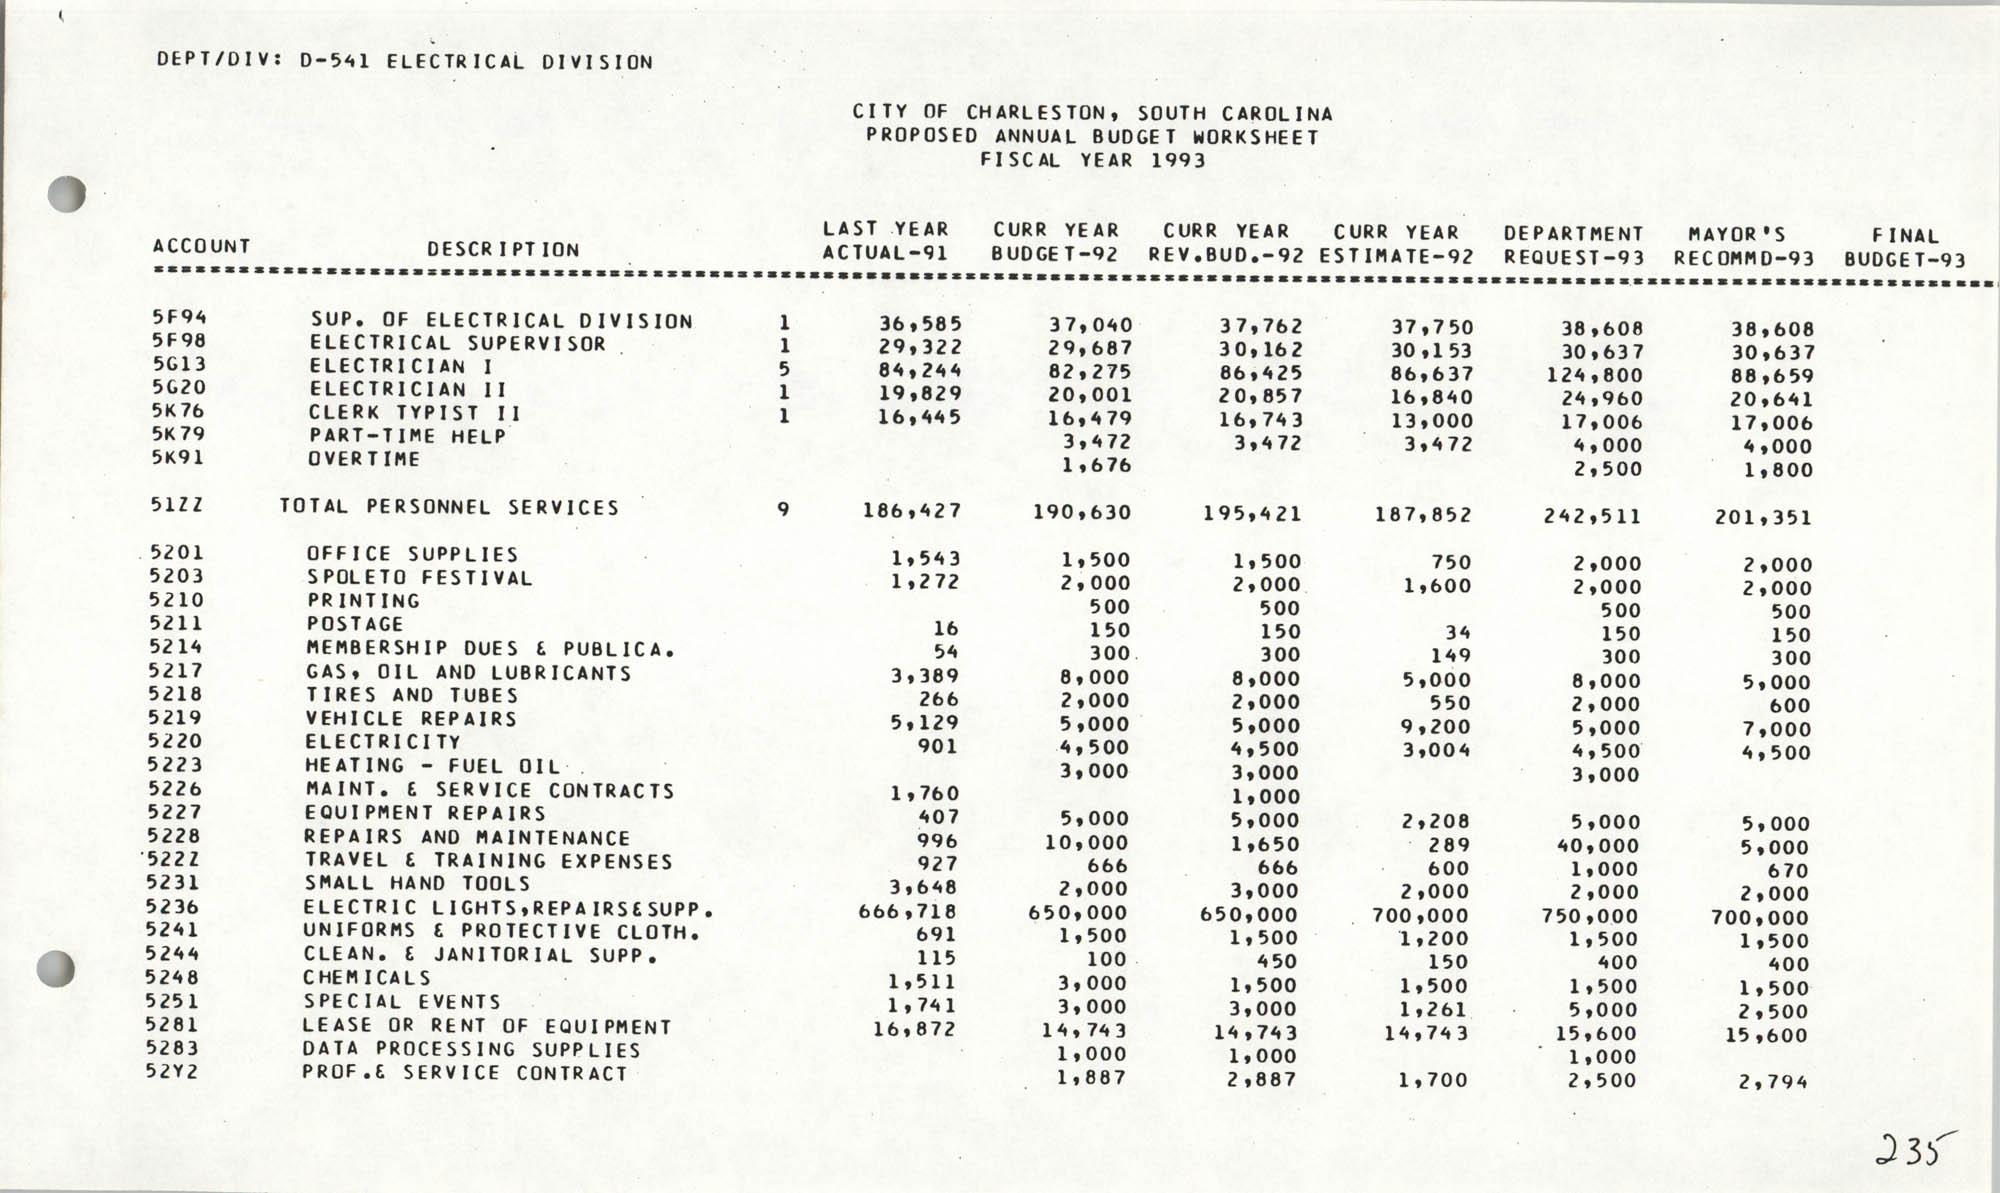 The City Council of Charleston, South Carolina, 1993 Budget, Page 235